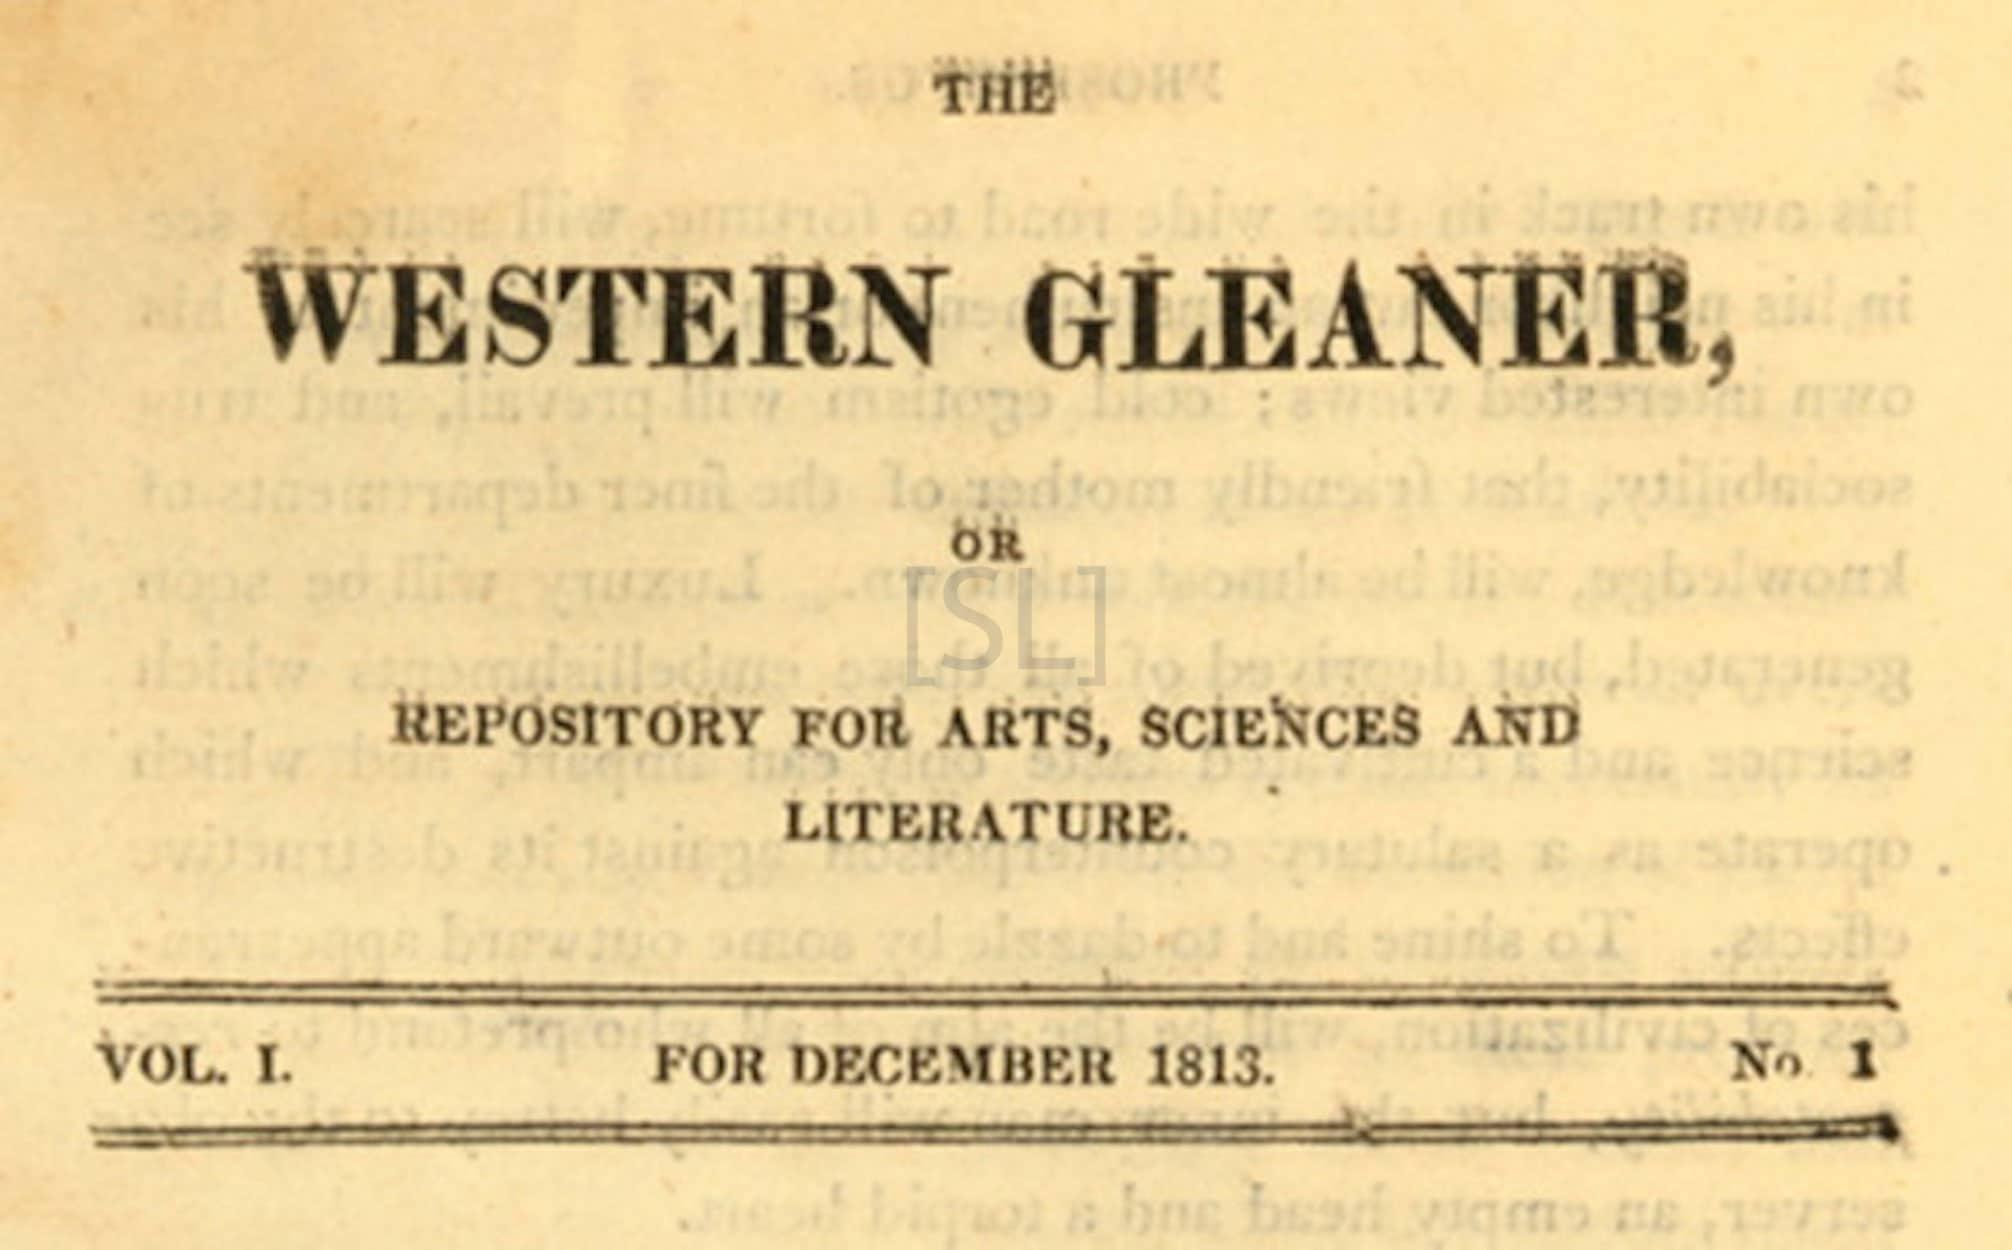 Western Gleaner